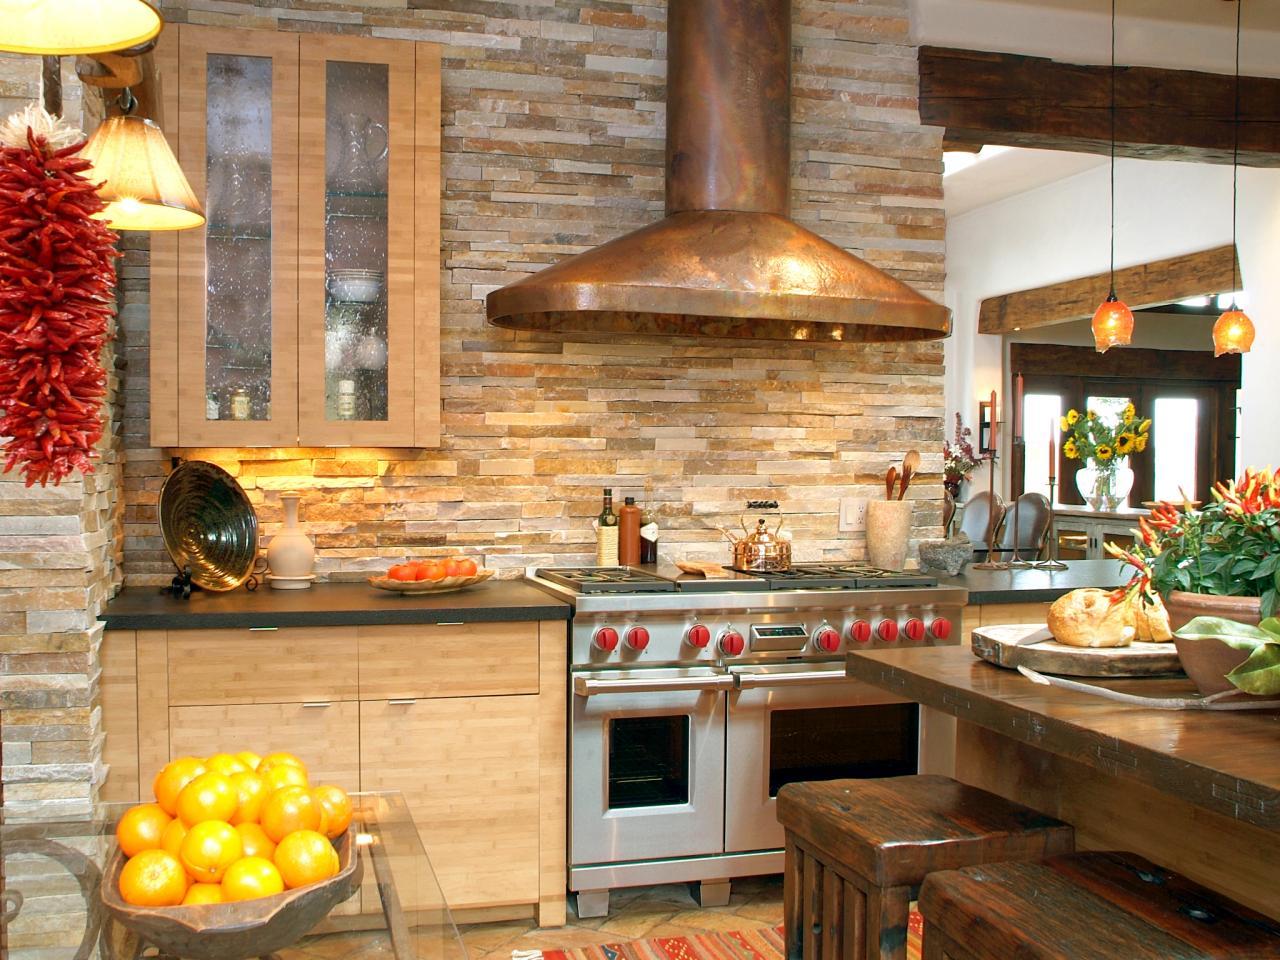 Uncategorized Kitchens With Stone Backsplash kitchens with stone backsplash mosaic backsplashes pictures ideas tips from hgtv hgtv